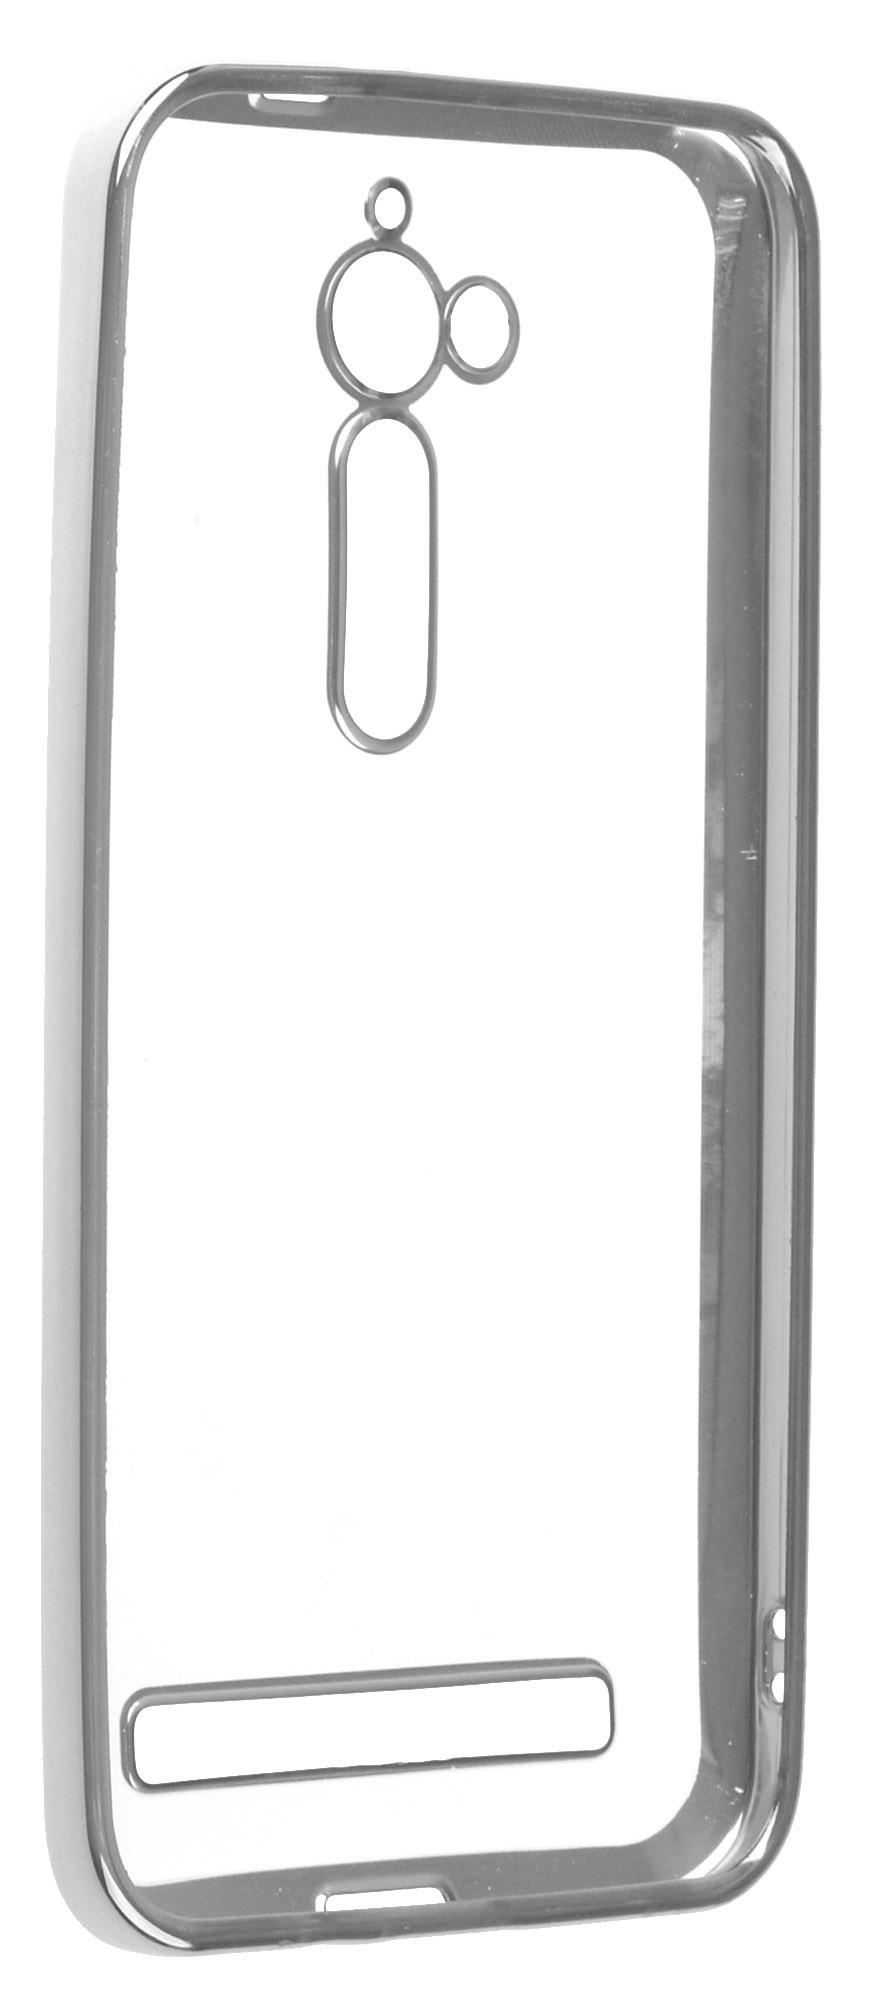 Чехол для сотового телефона skinBOX Silicone chrome border, 4660041408188, серебристый чехол для сотового телефона skinbox silicone chrome border 4630042524514 серебристый